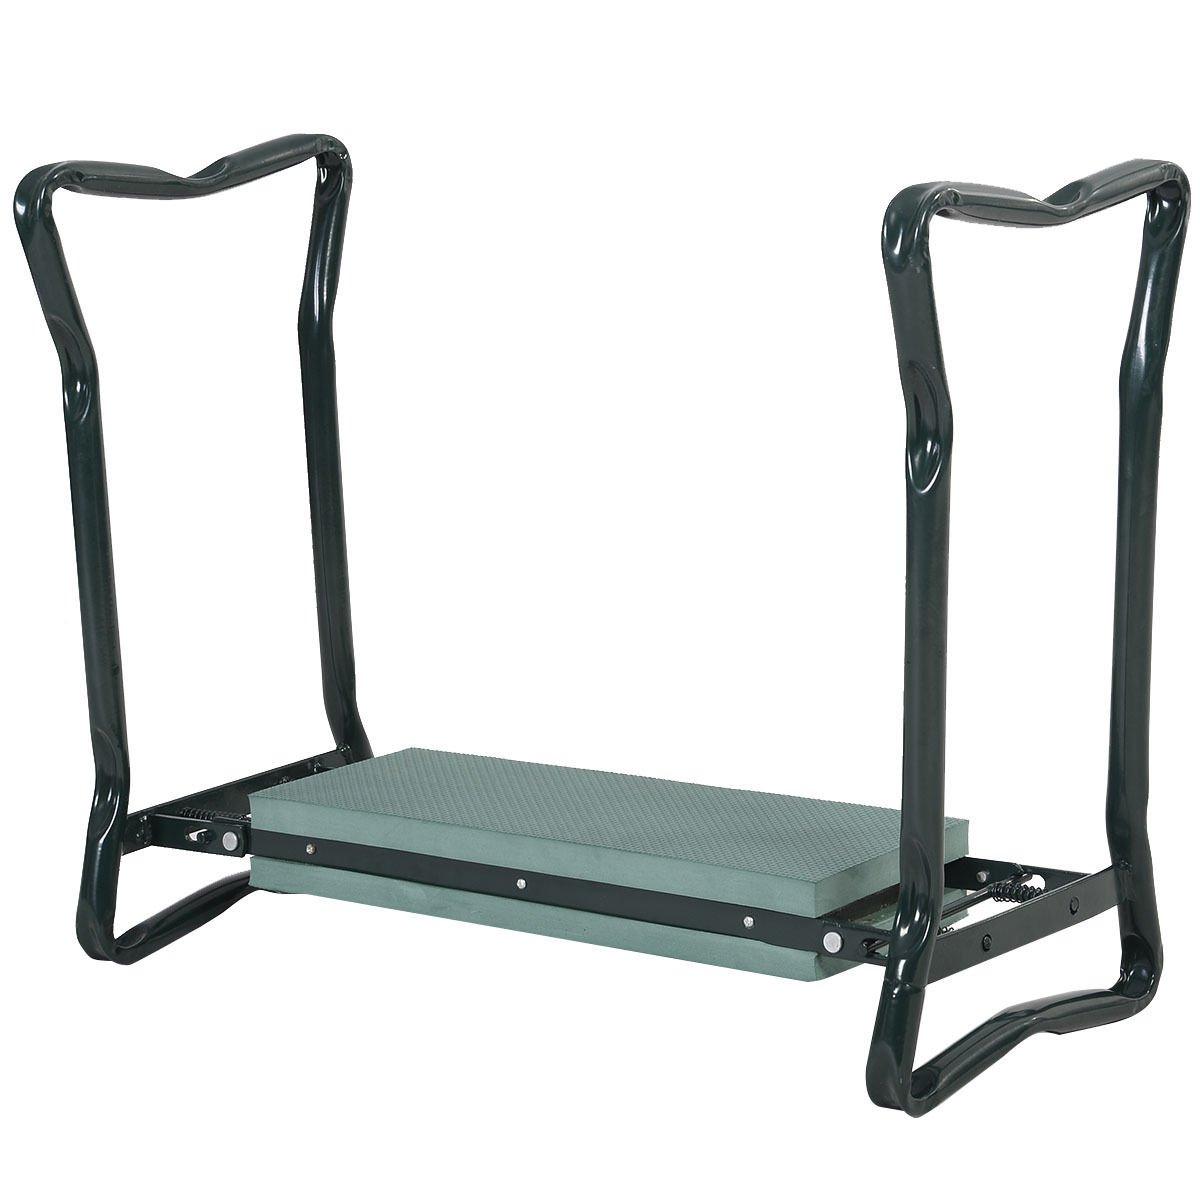 Smartbuy247 Folding Sturdy Garden Kneeler Gardener Kneeling Pad & Cushion Seat Knee Pad Seat